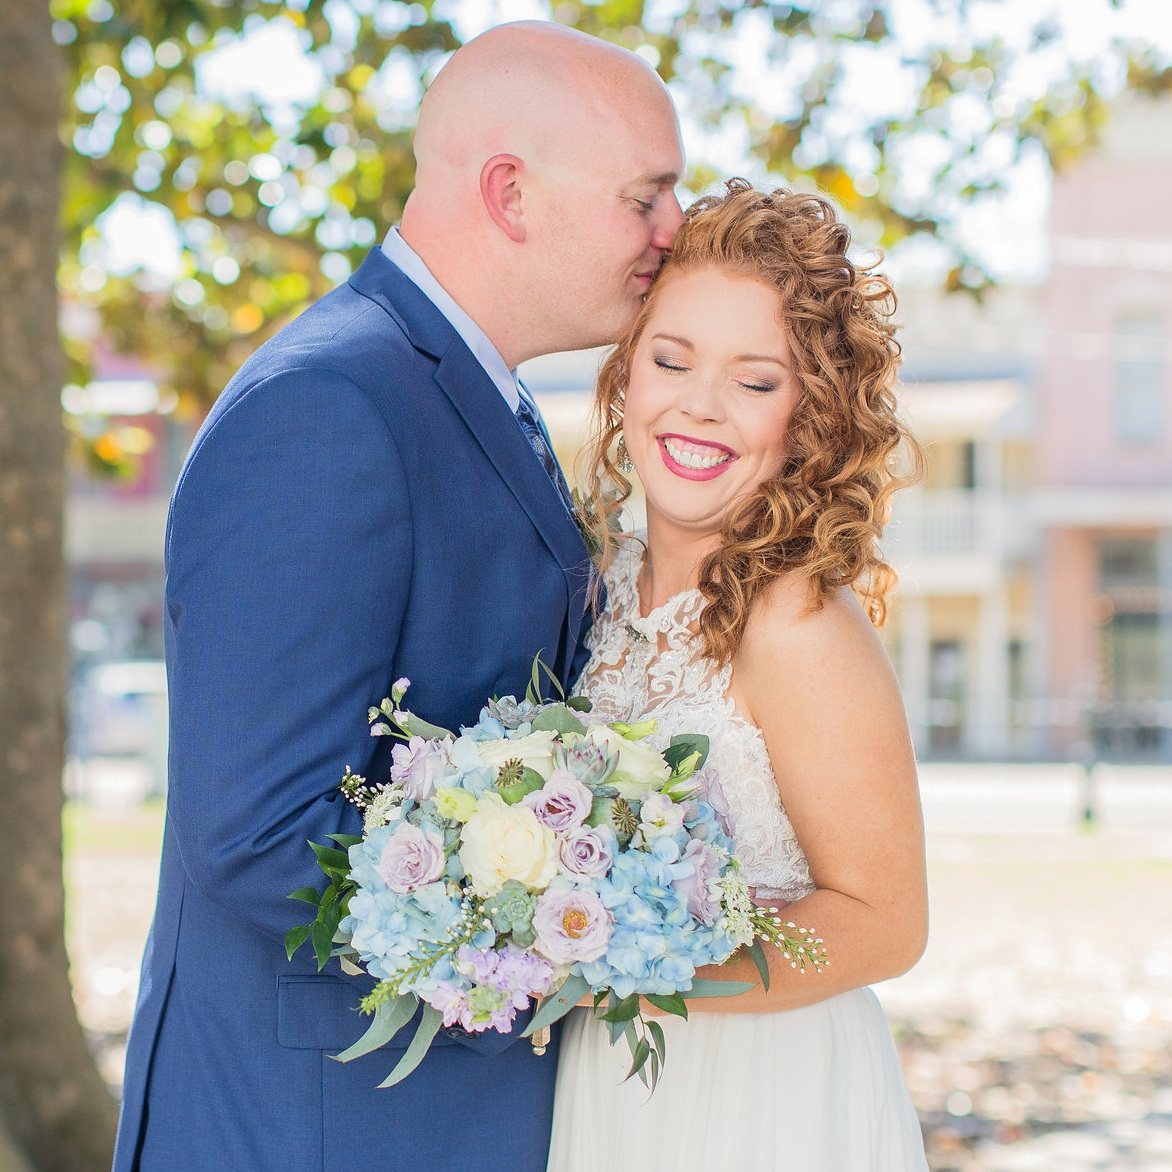 MRS. ANDREA BROOKS WEST  Photographer | Katelynn Anne Photography Dress | Martina Liana